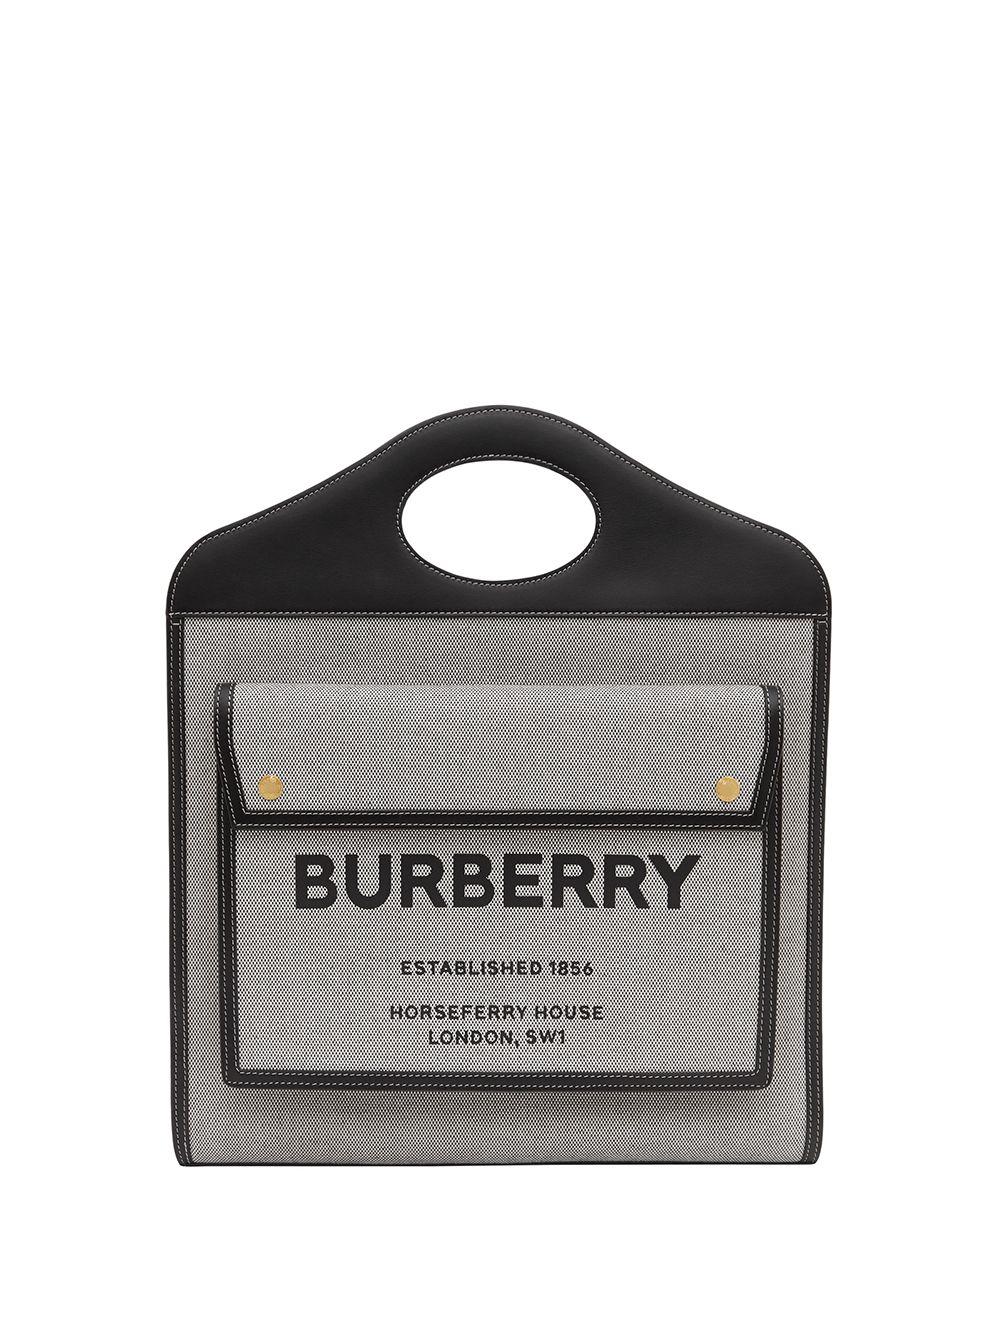 Burberry Mittelgroße Pocket Handtasche - Schwarz